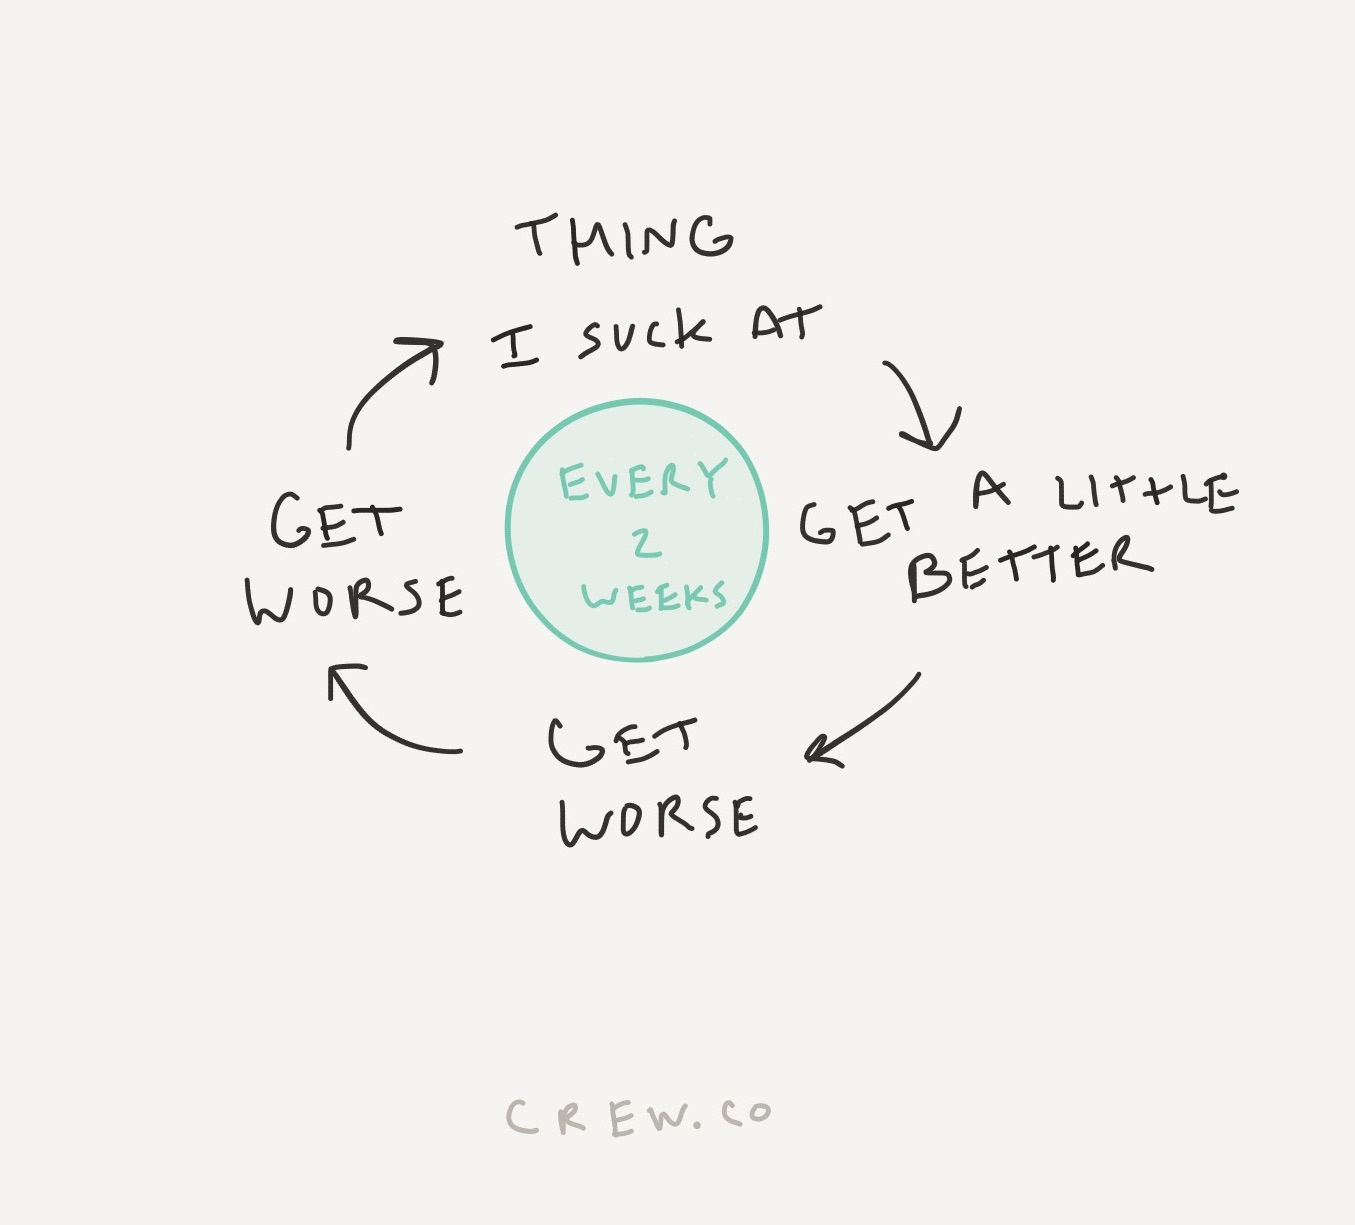 My behavior cycle